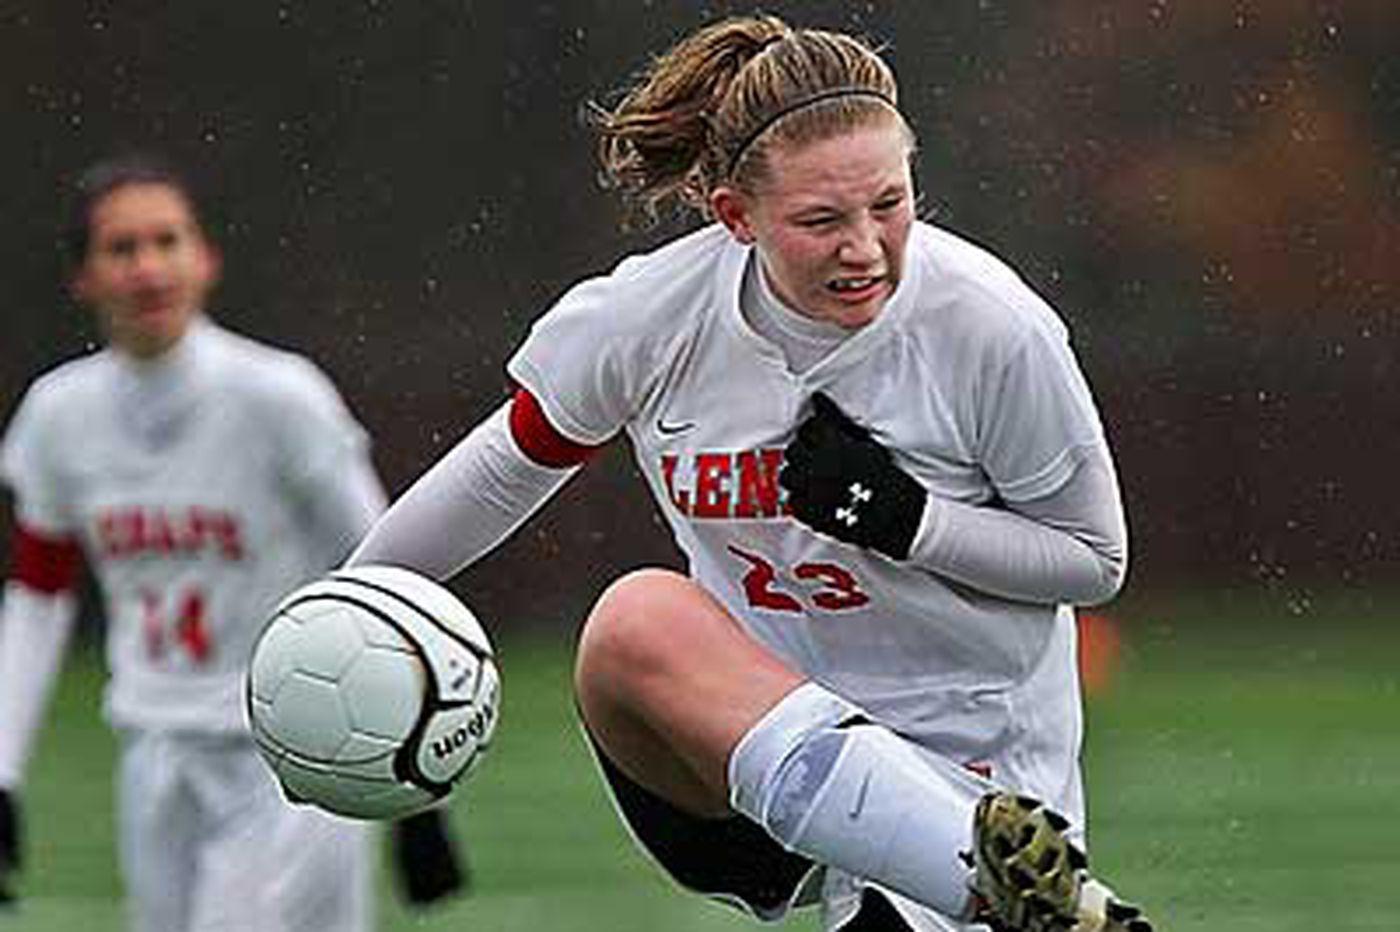 Three from Lenape among girls' soccer all-stars